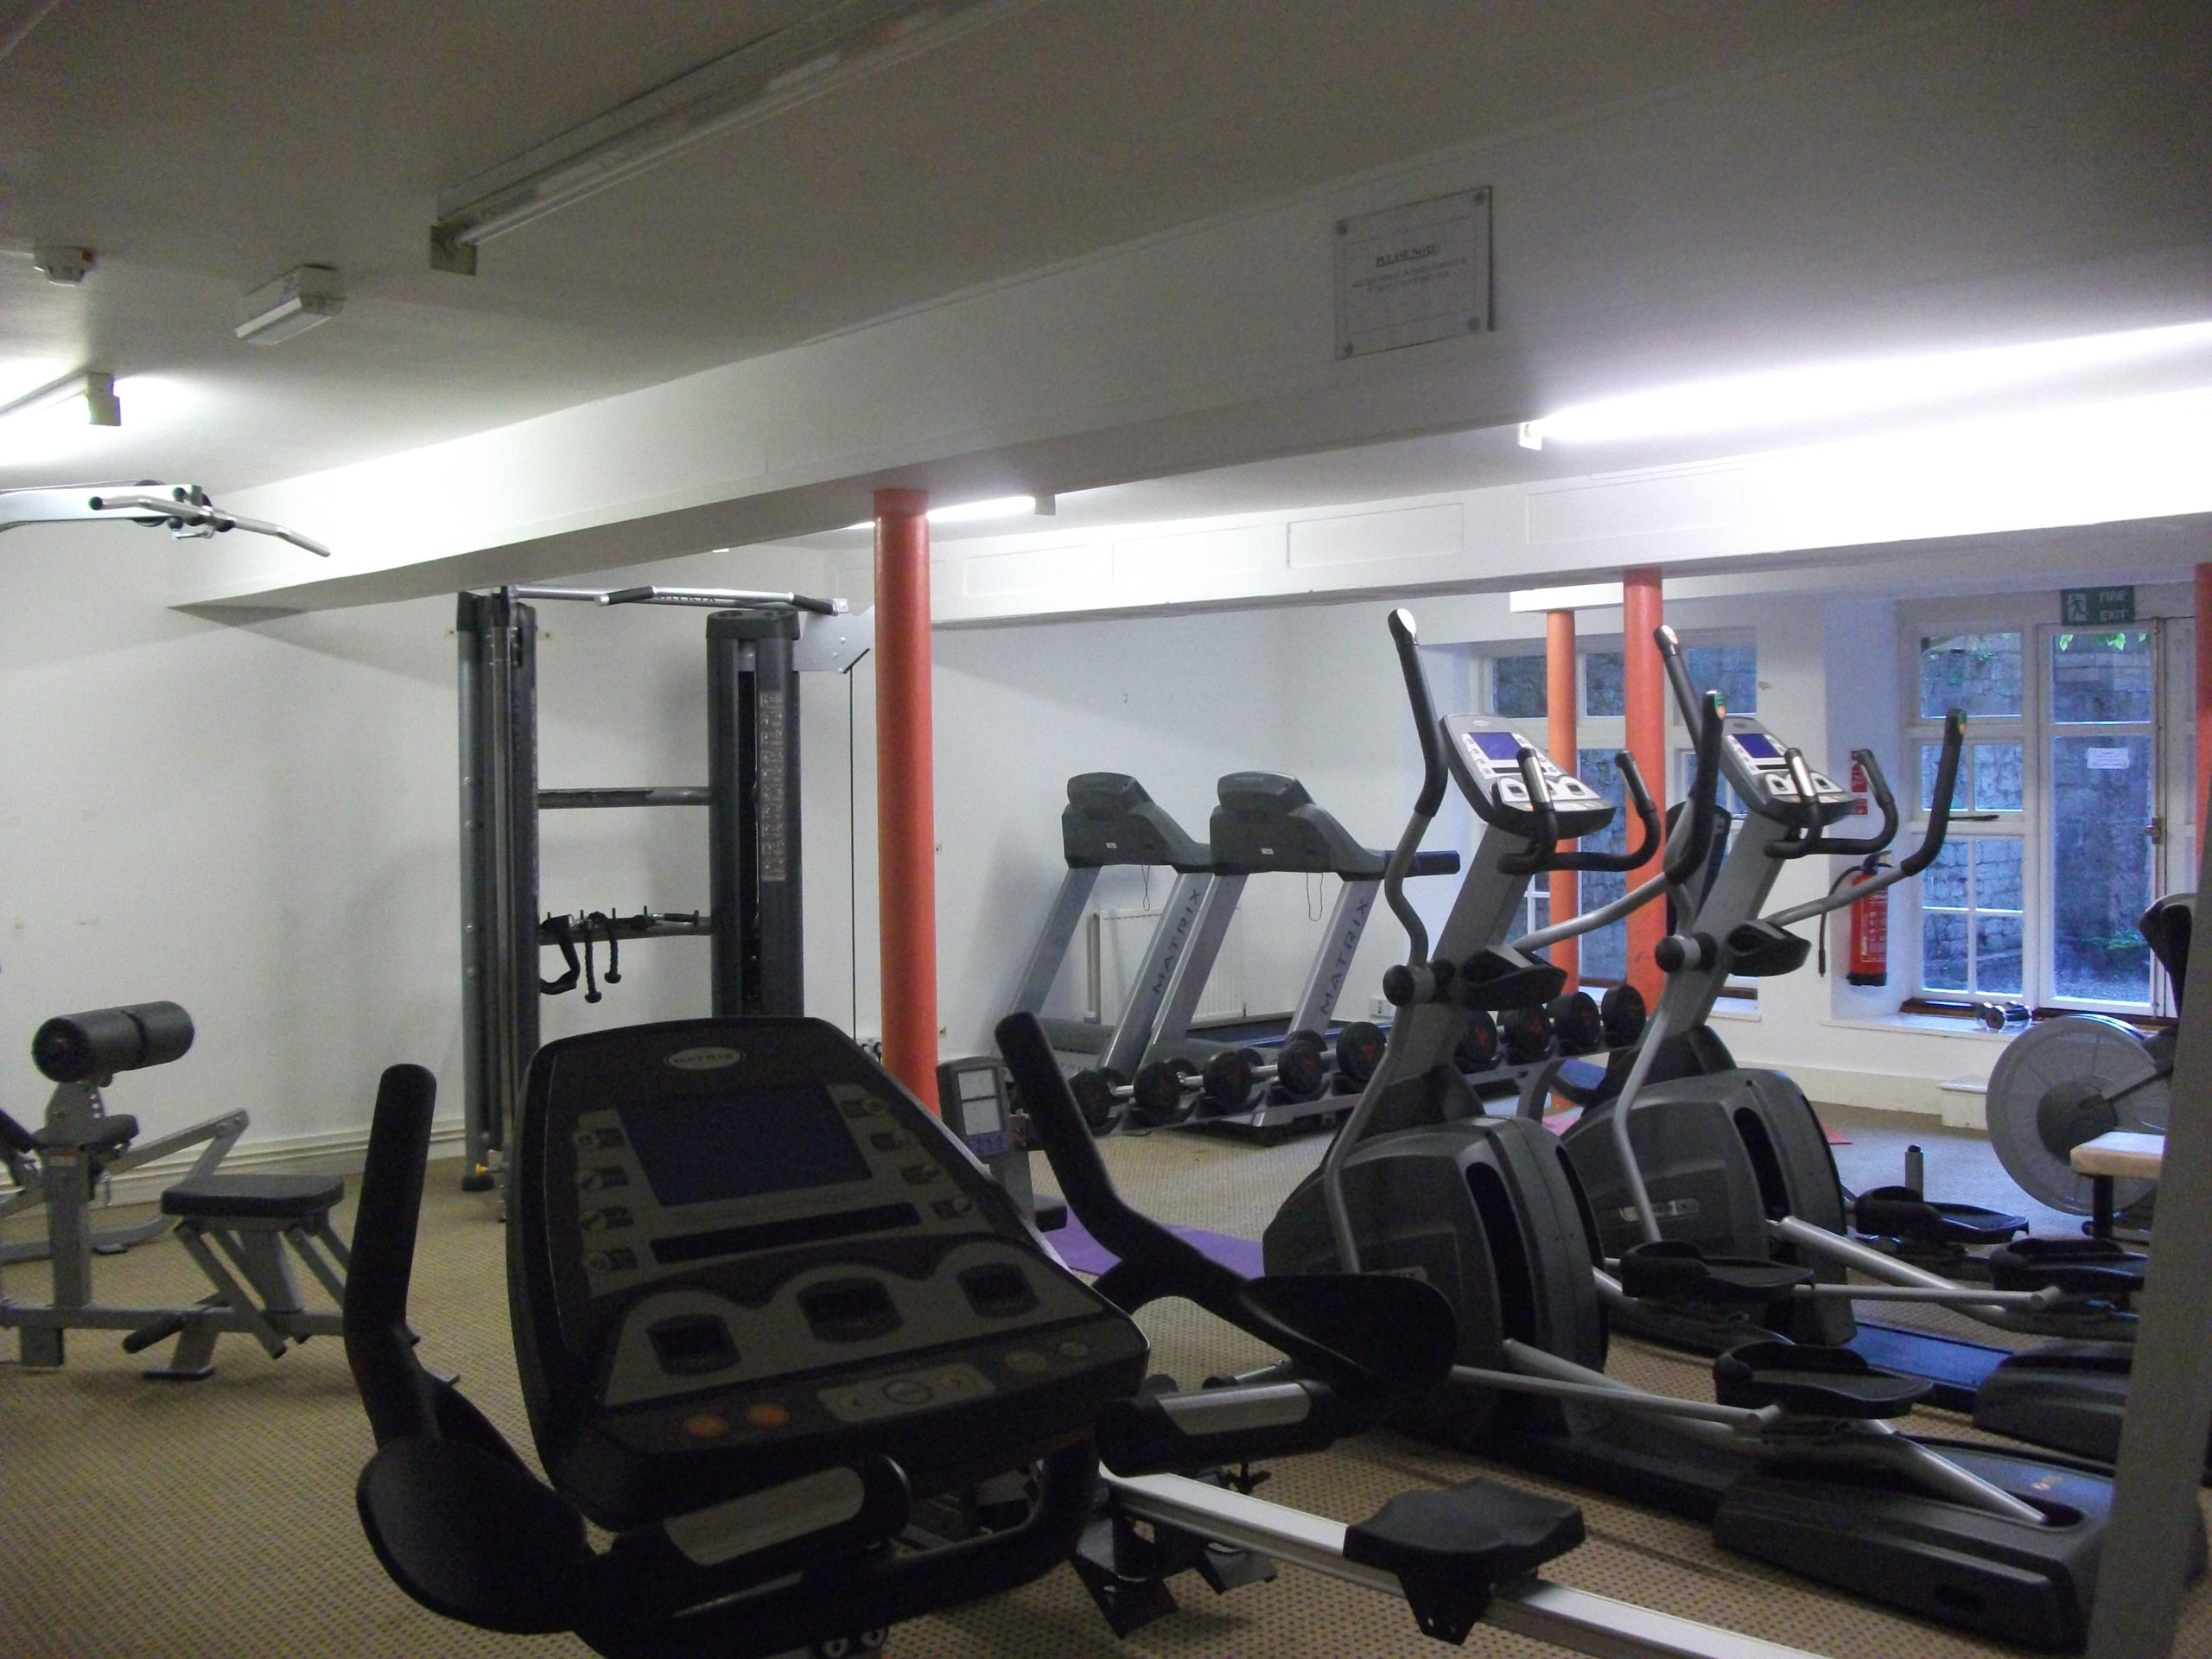 Gymnasium equipment